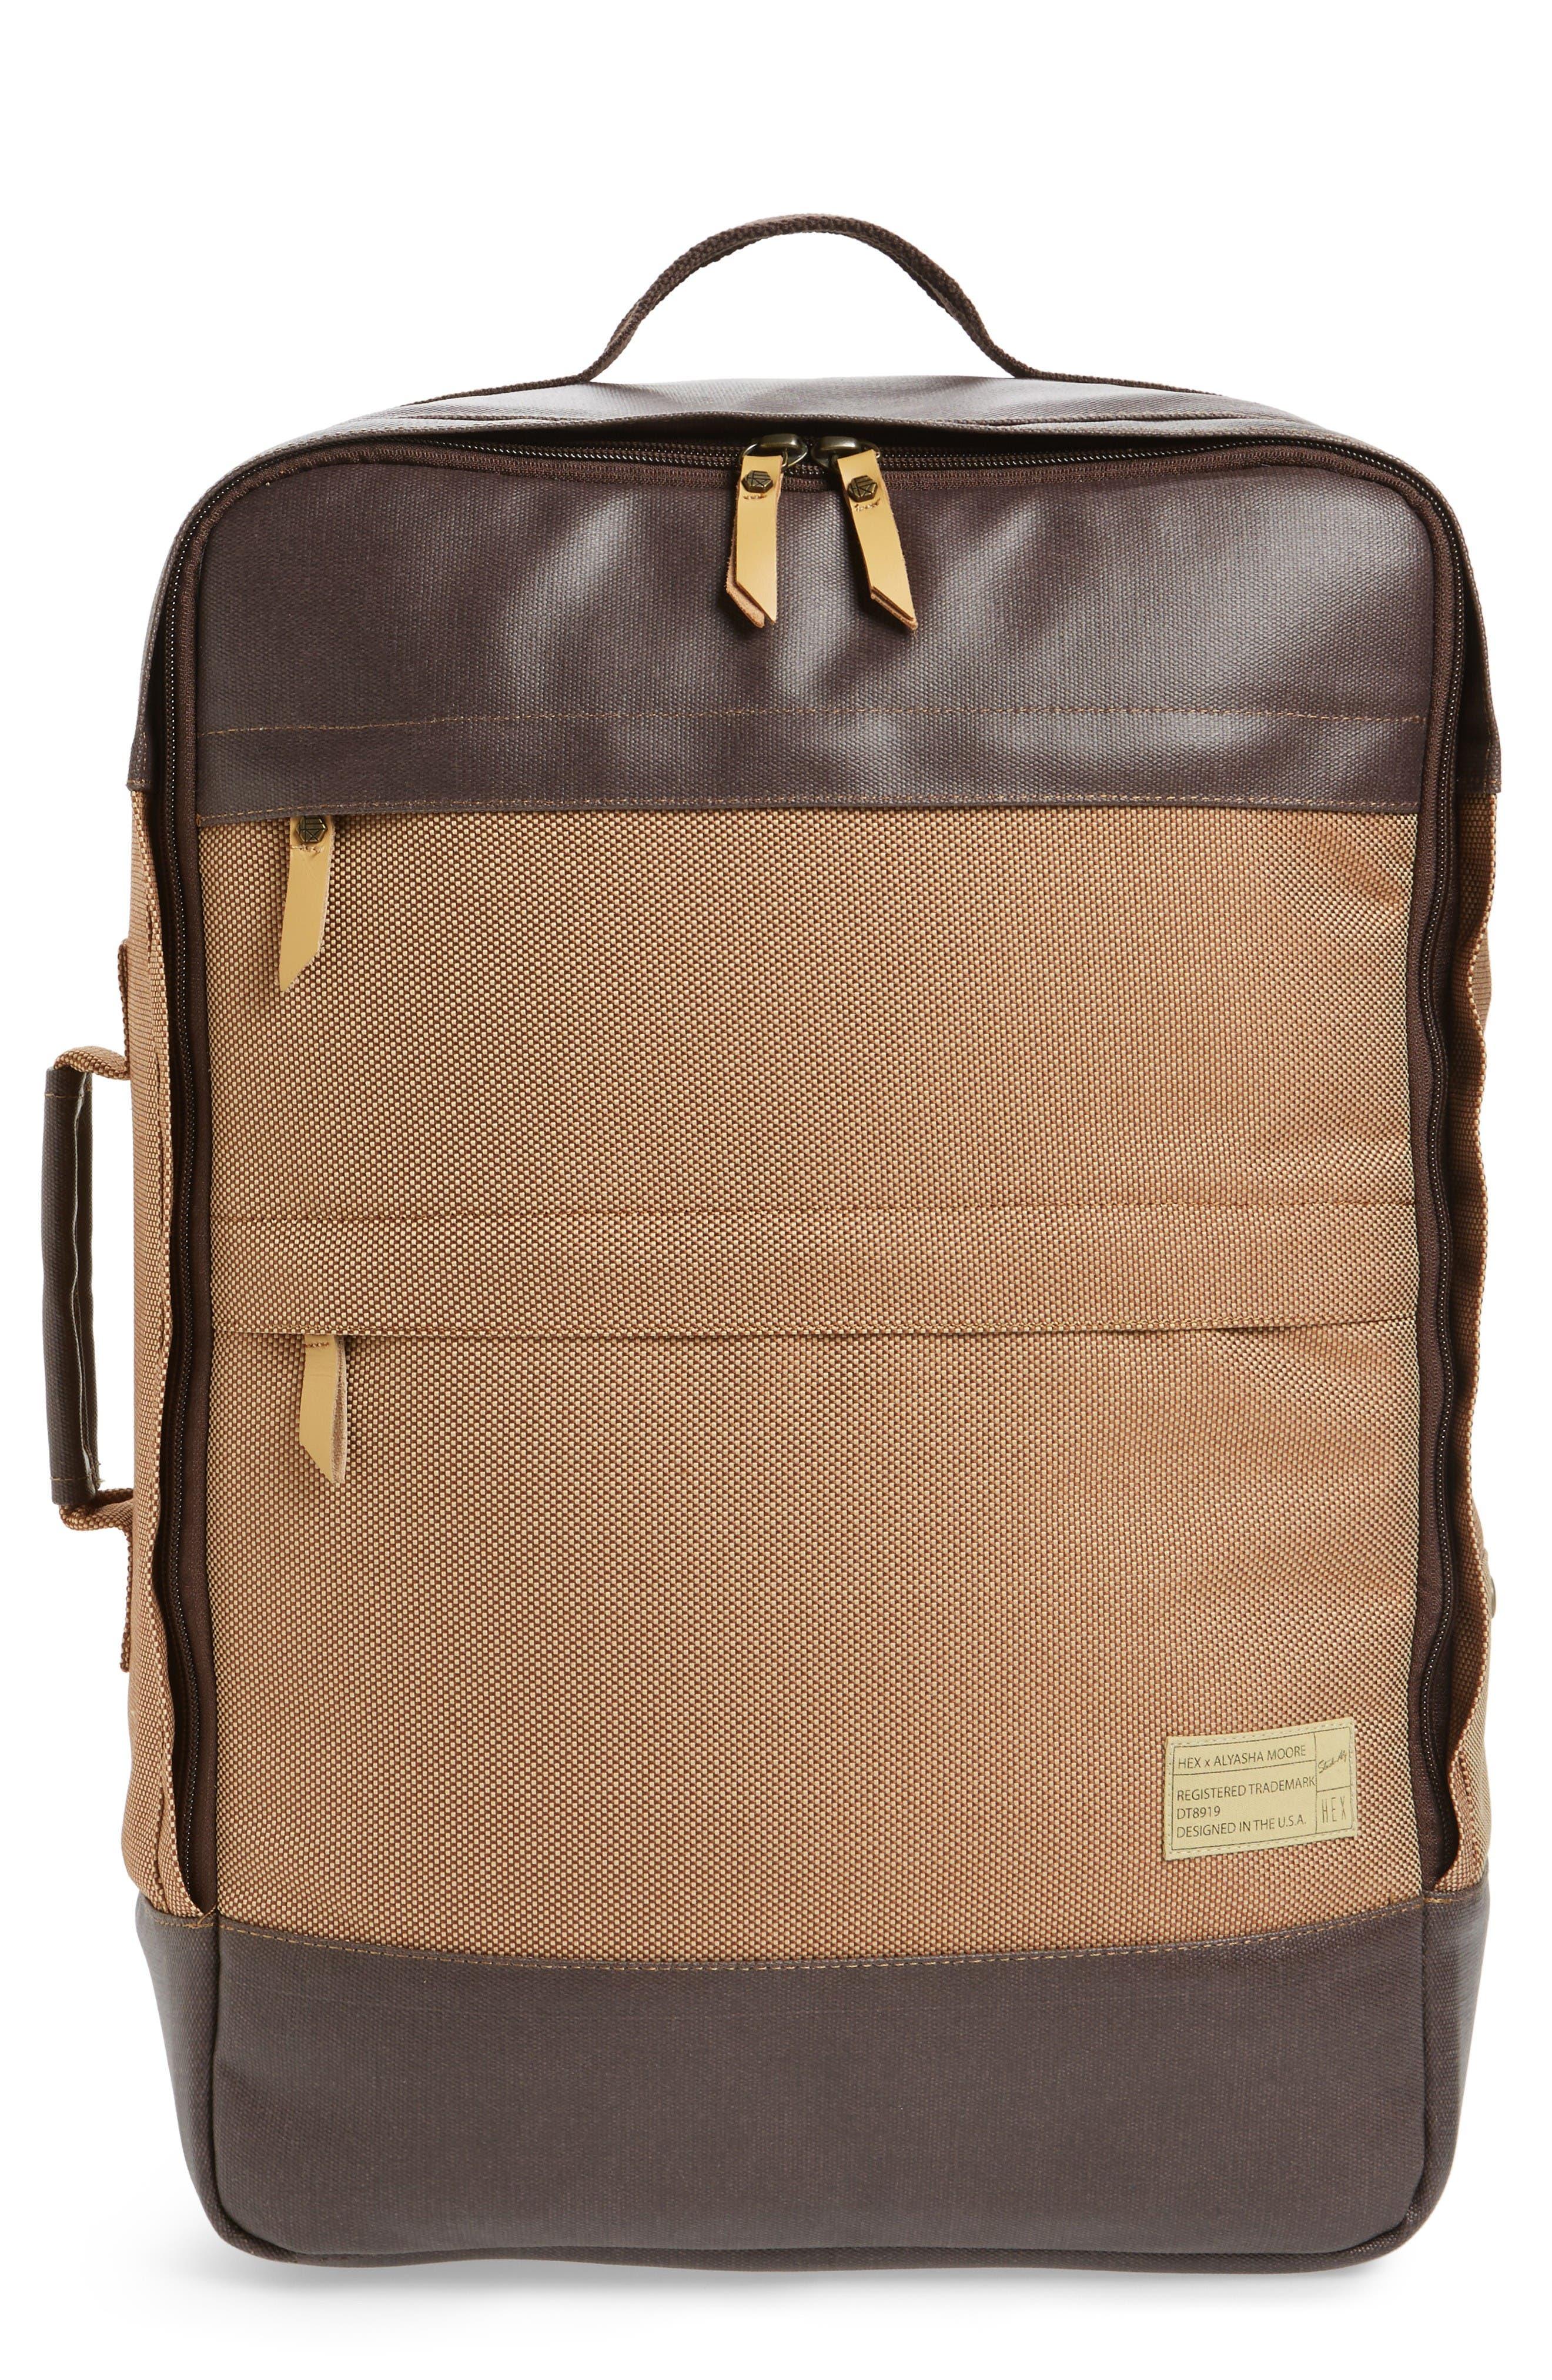 HEX Alyasha Travel Backpack